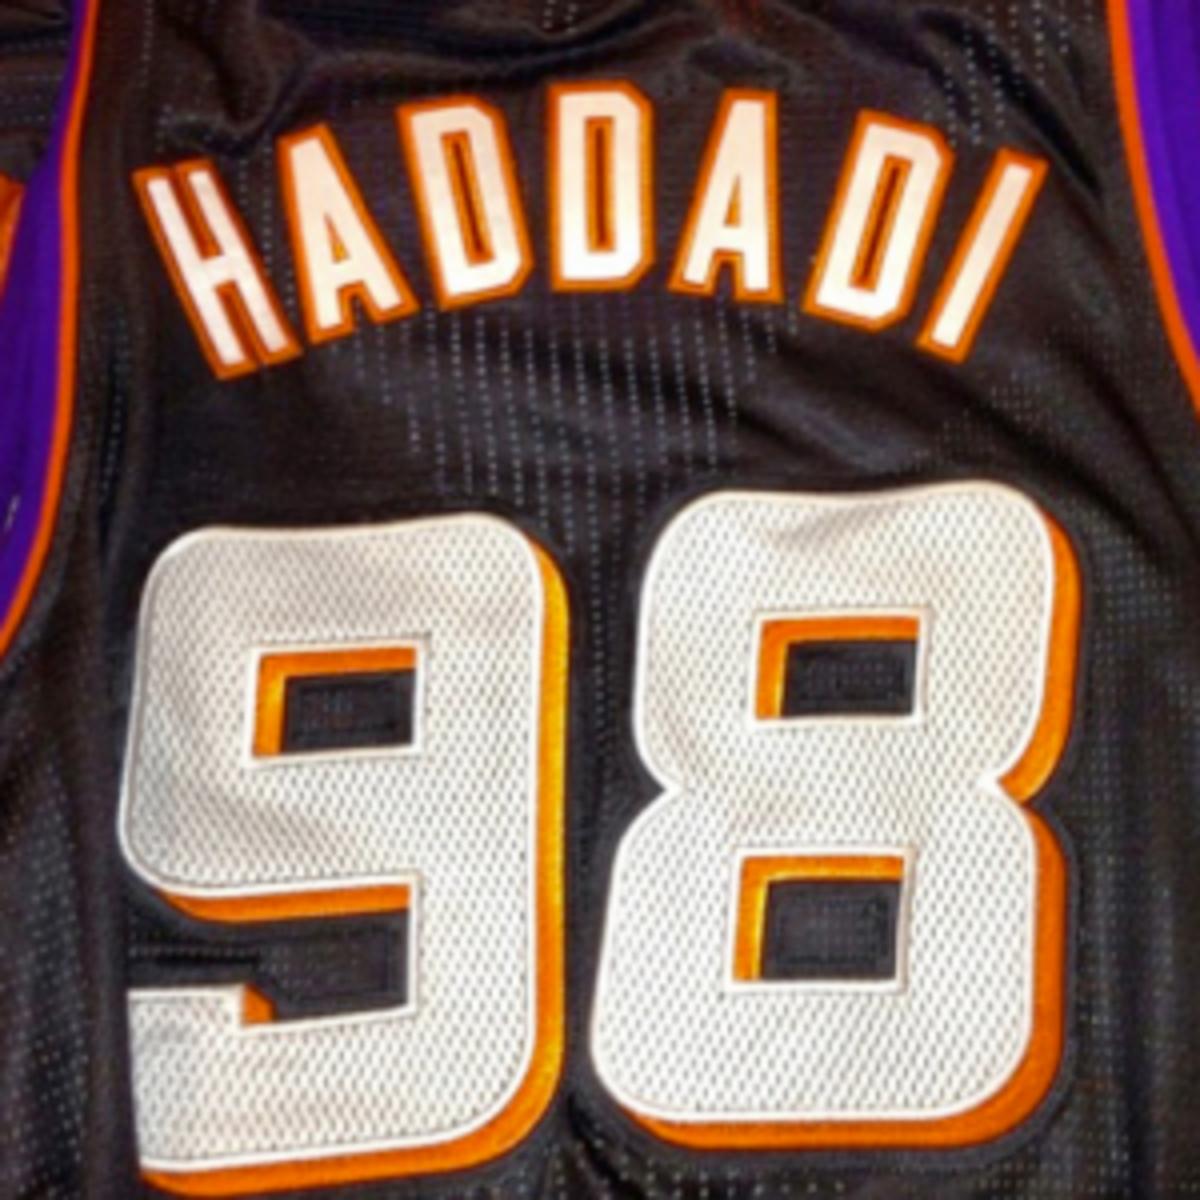 Hamed Haddadi's number is a tribute to his native Iran. (Instagram/Arash Markazi)